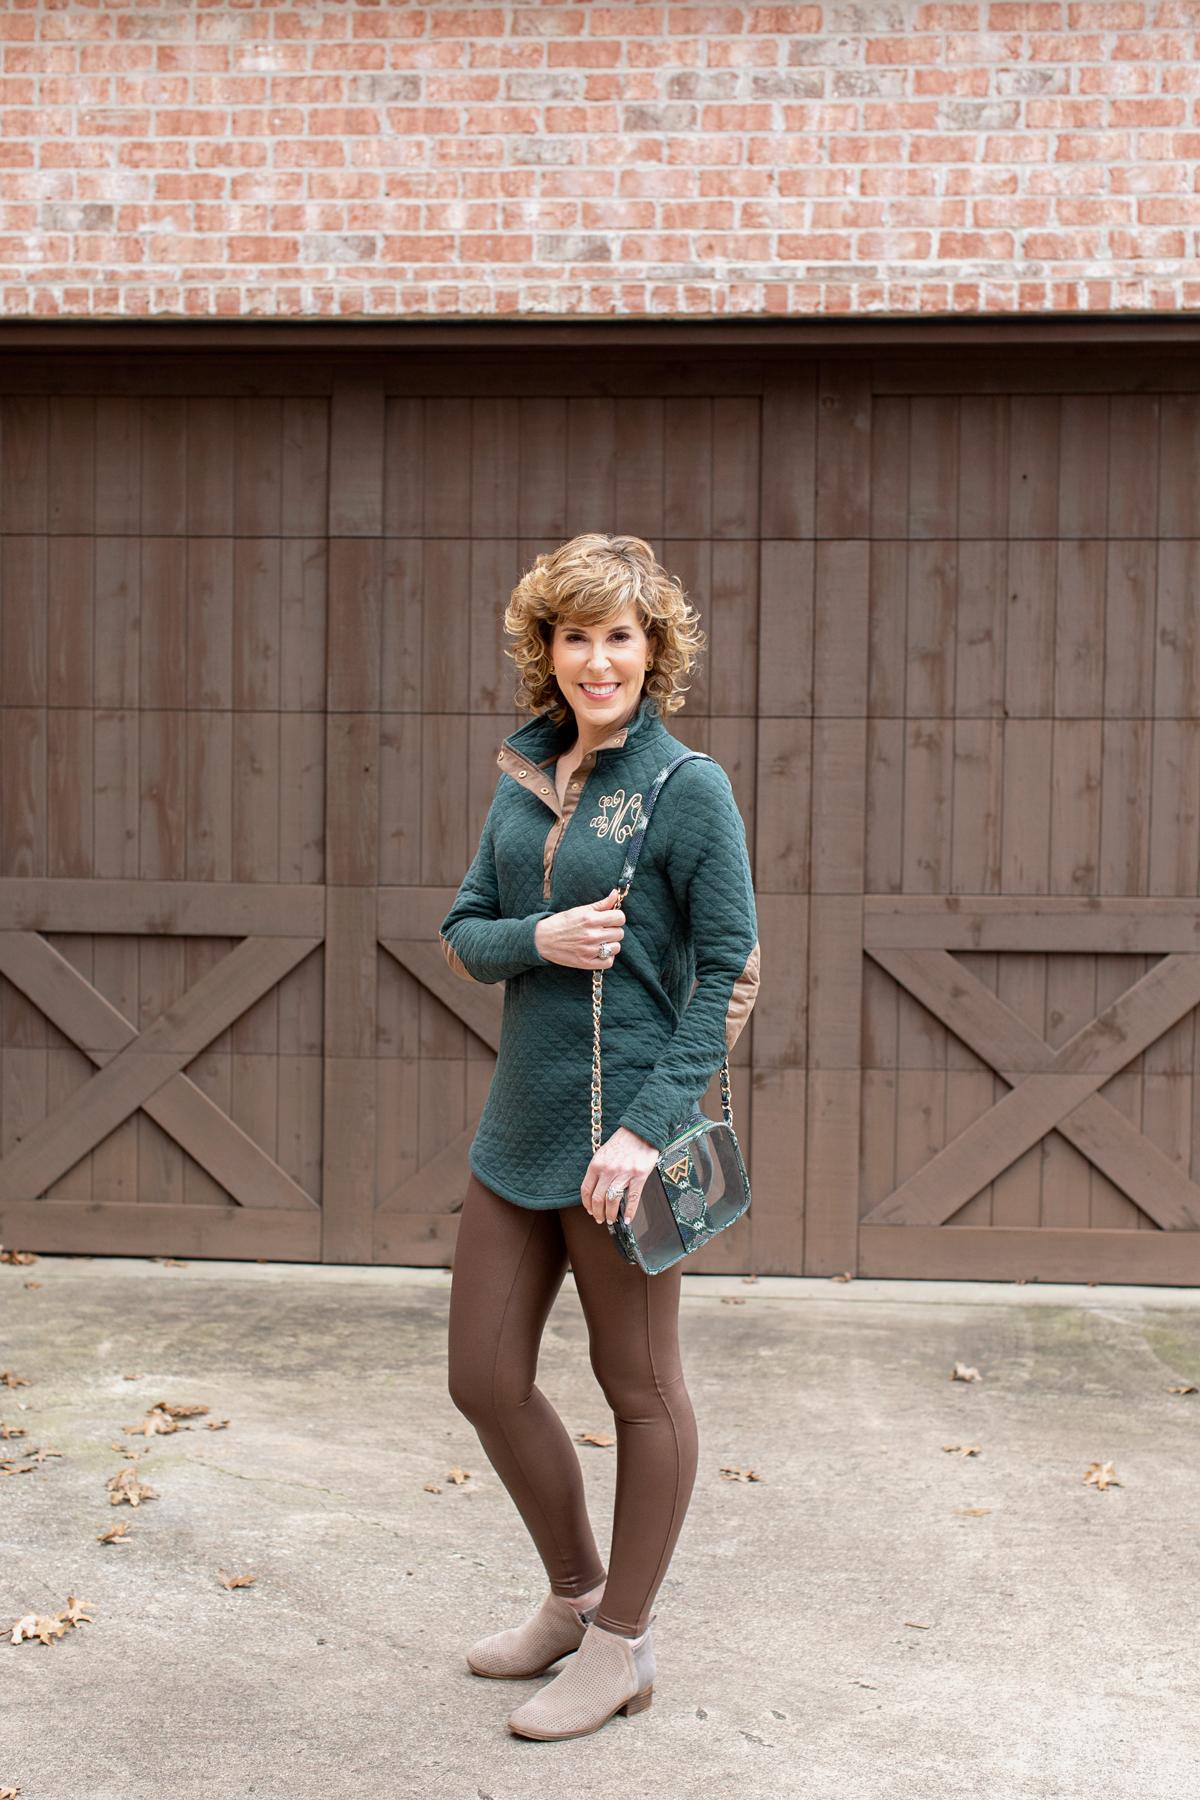 woman in green monogrammed sweatshirt standing on driveway